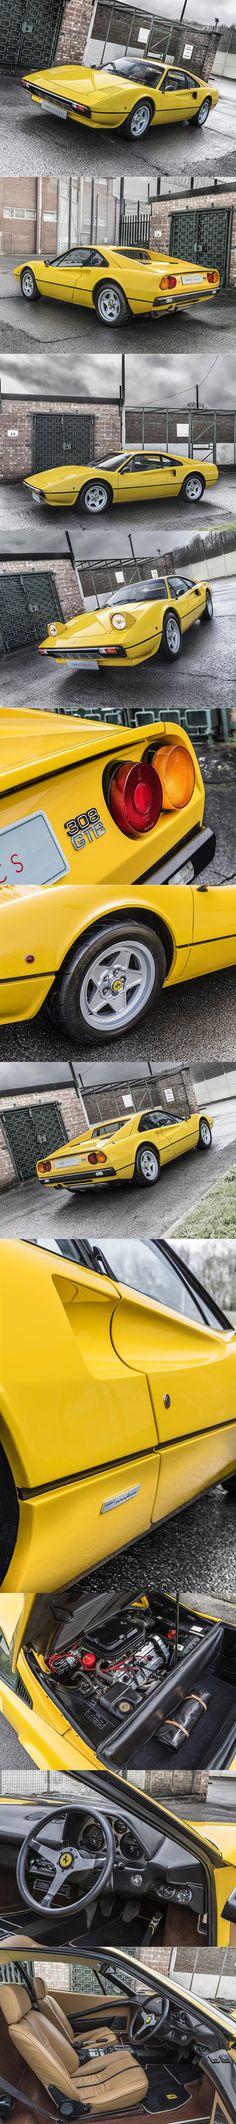 1976 Ferrari 308 GTB Vetroresina / Pininfarina Leonardo Fioravanti / 252 hp / 808 produced / glass-reinforced plastic / Italy / yellow